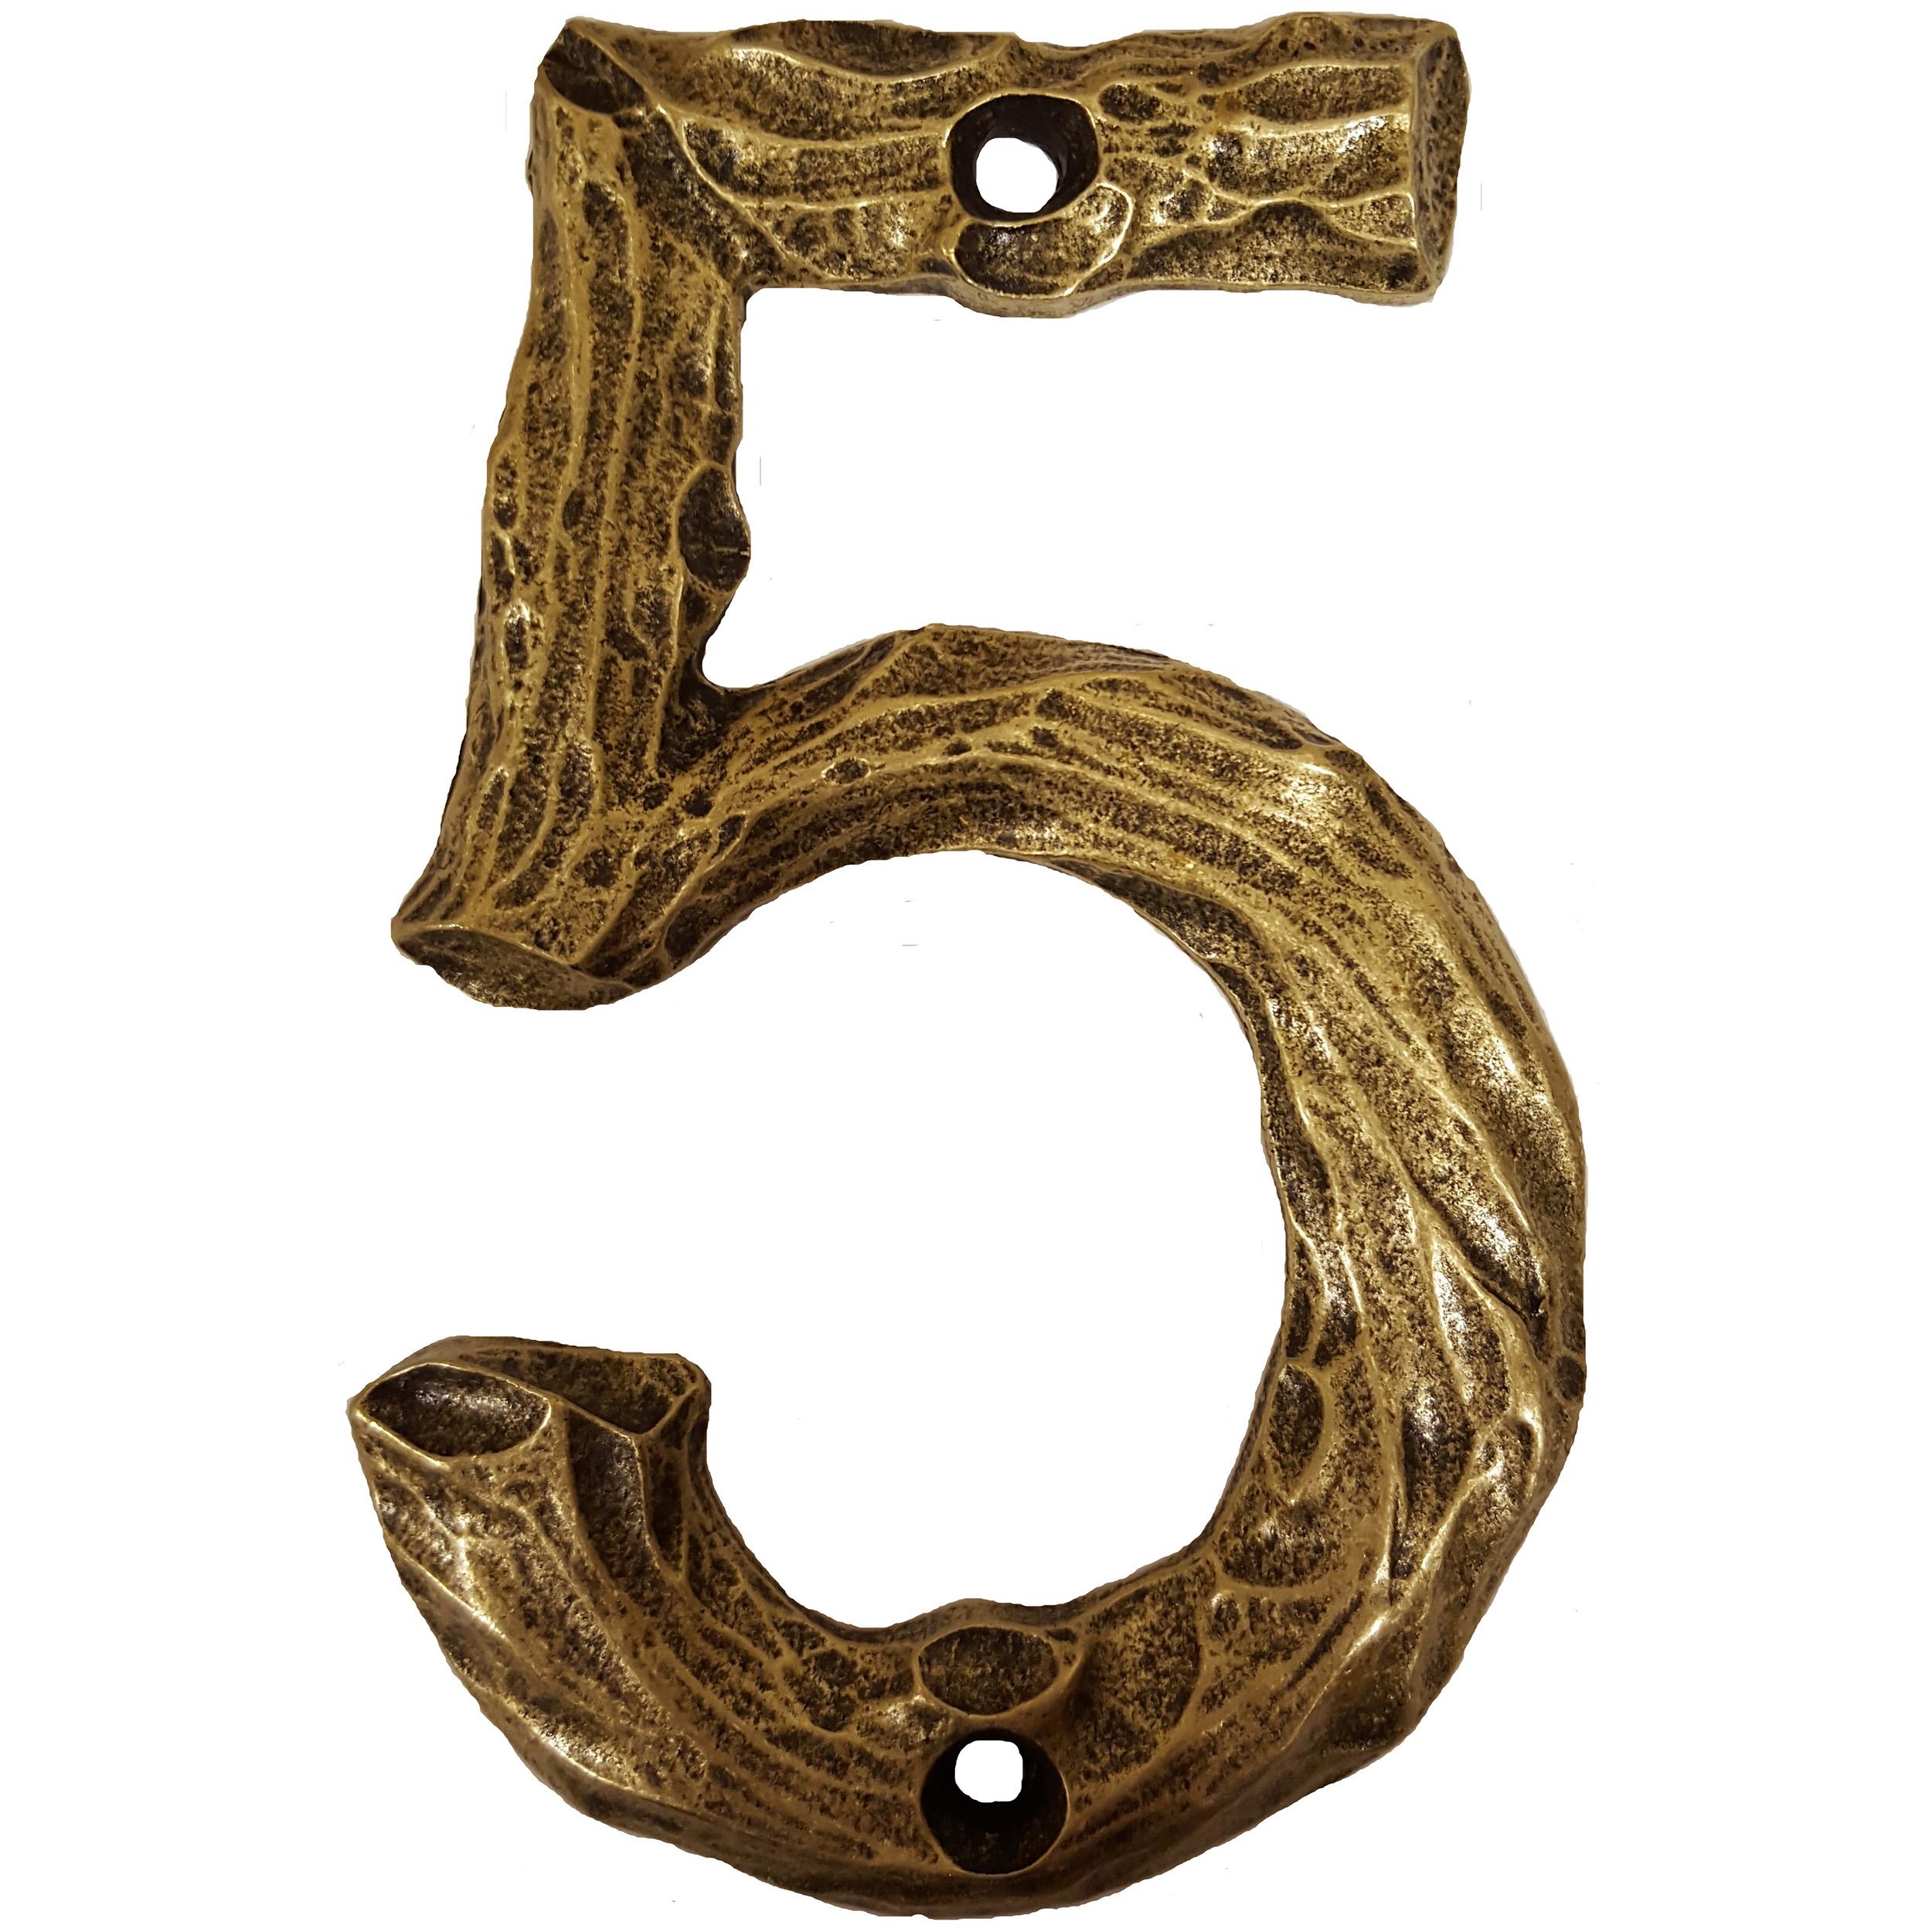 LHN5-AB Log House Number 5, Antique Brass, 1 piece